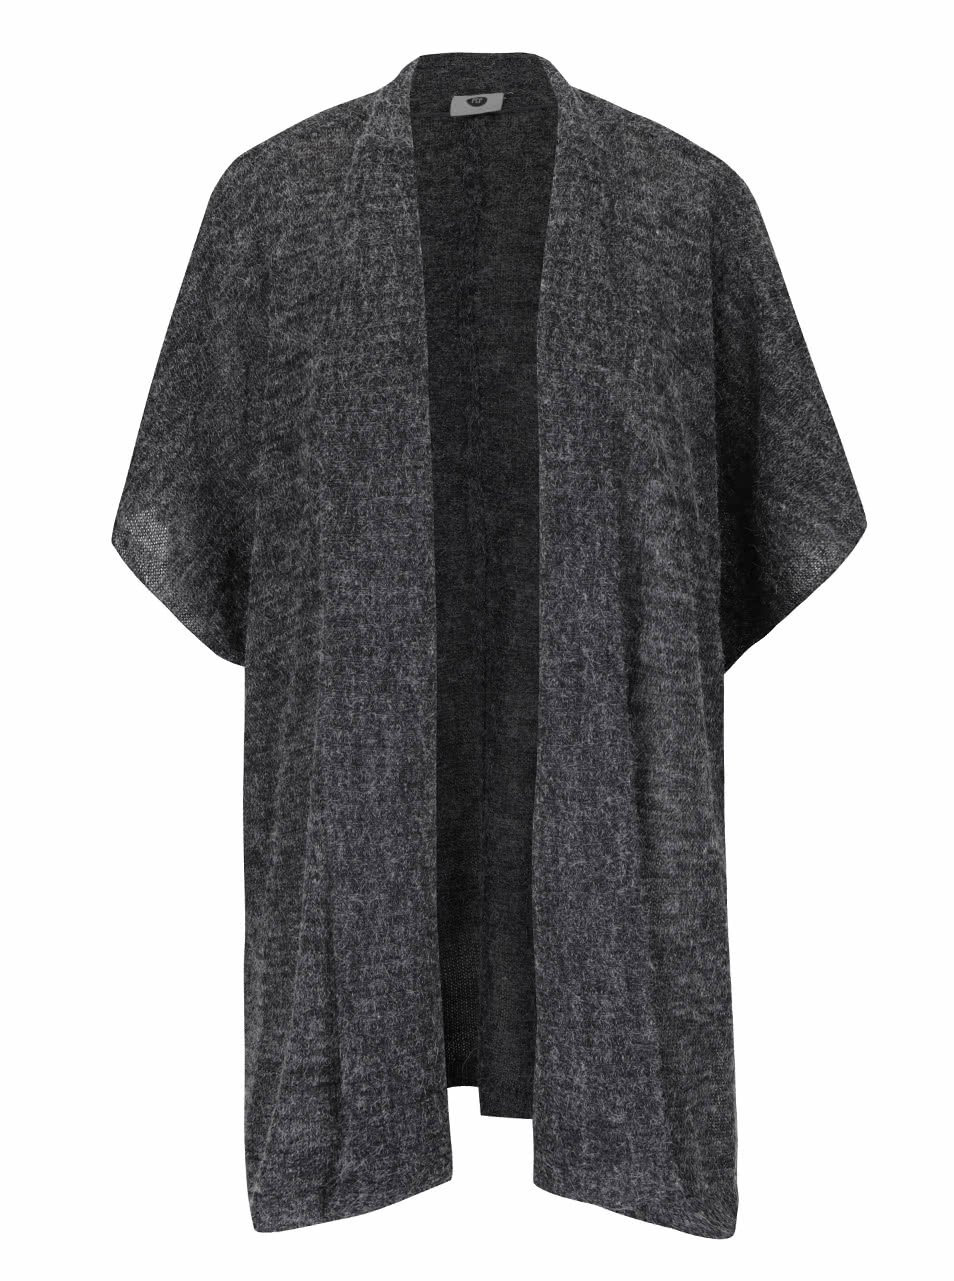 Tmavě šedý žíhaný dámský cardigan PEP Flannery